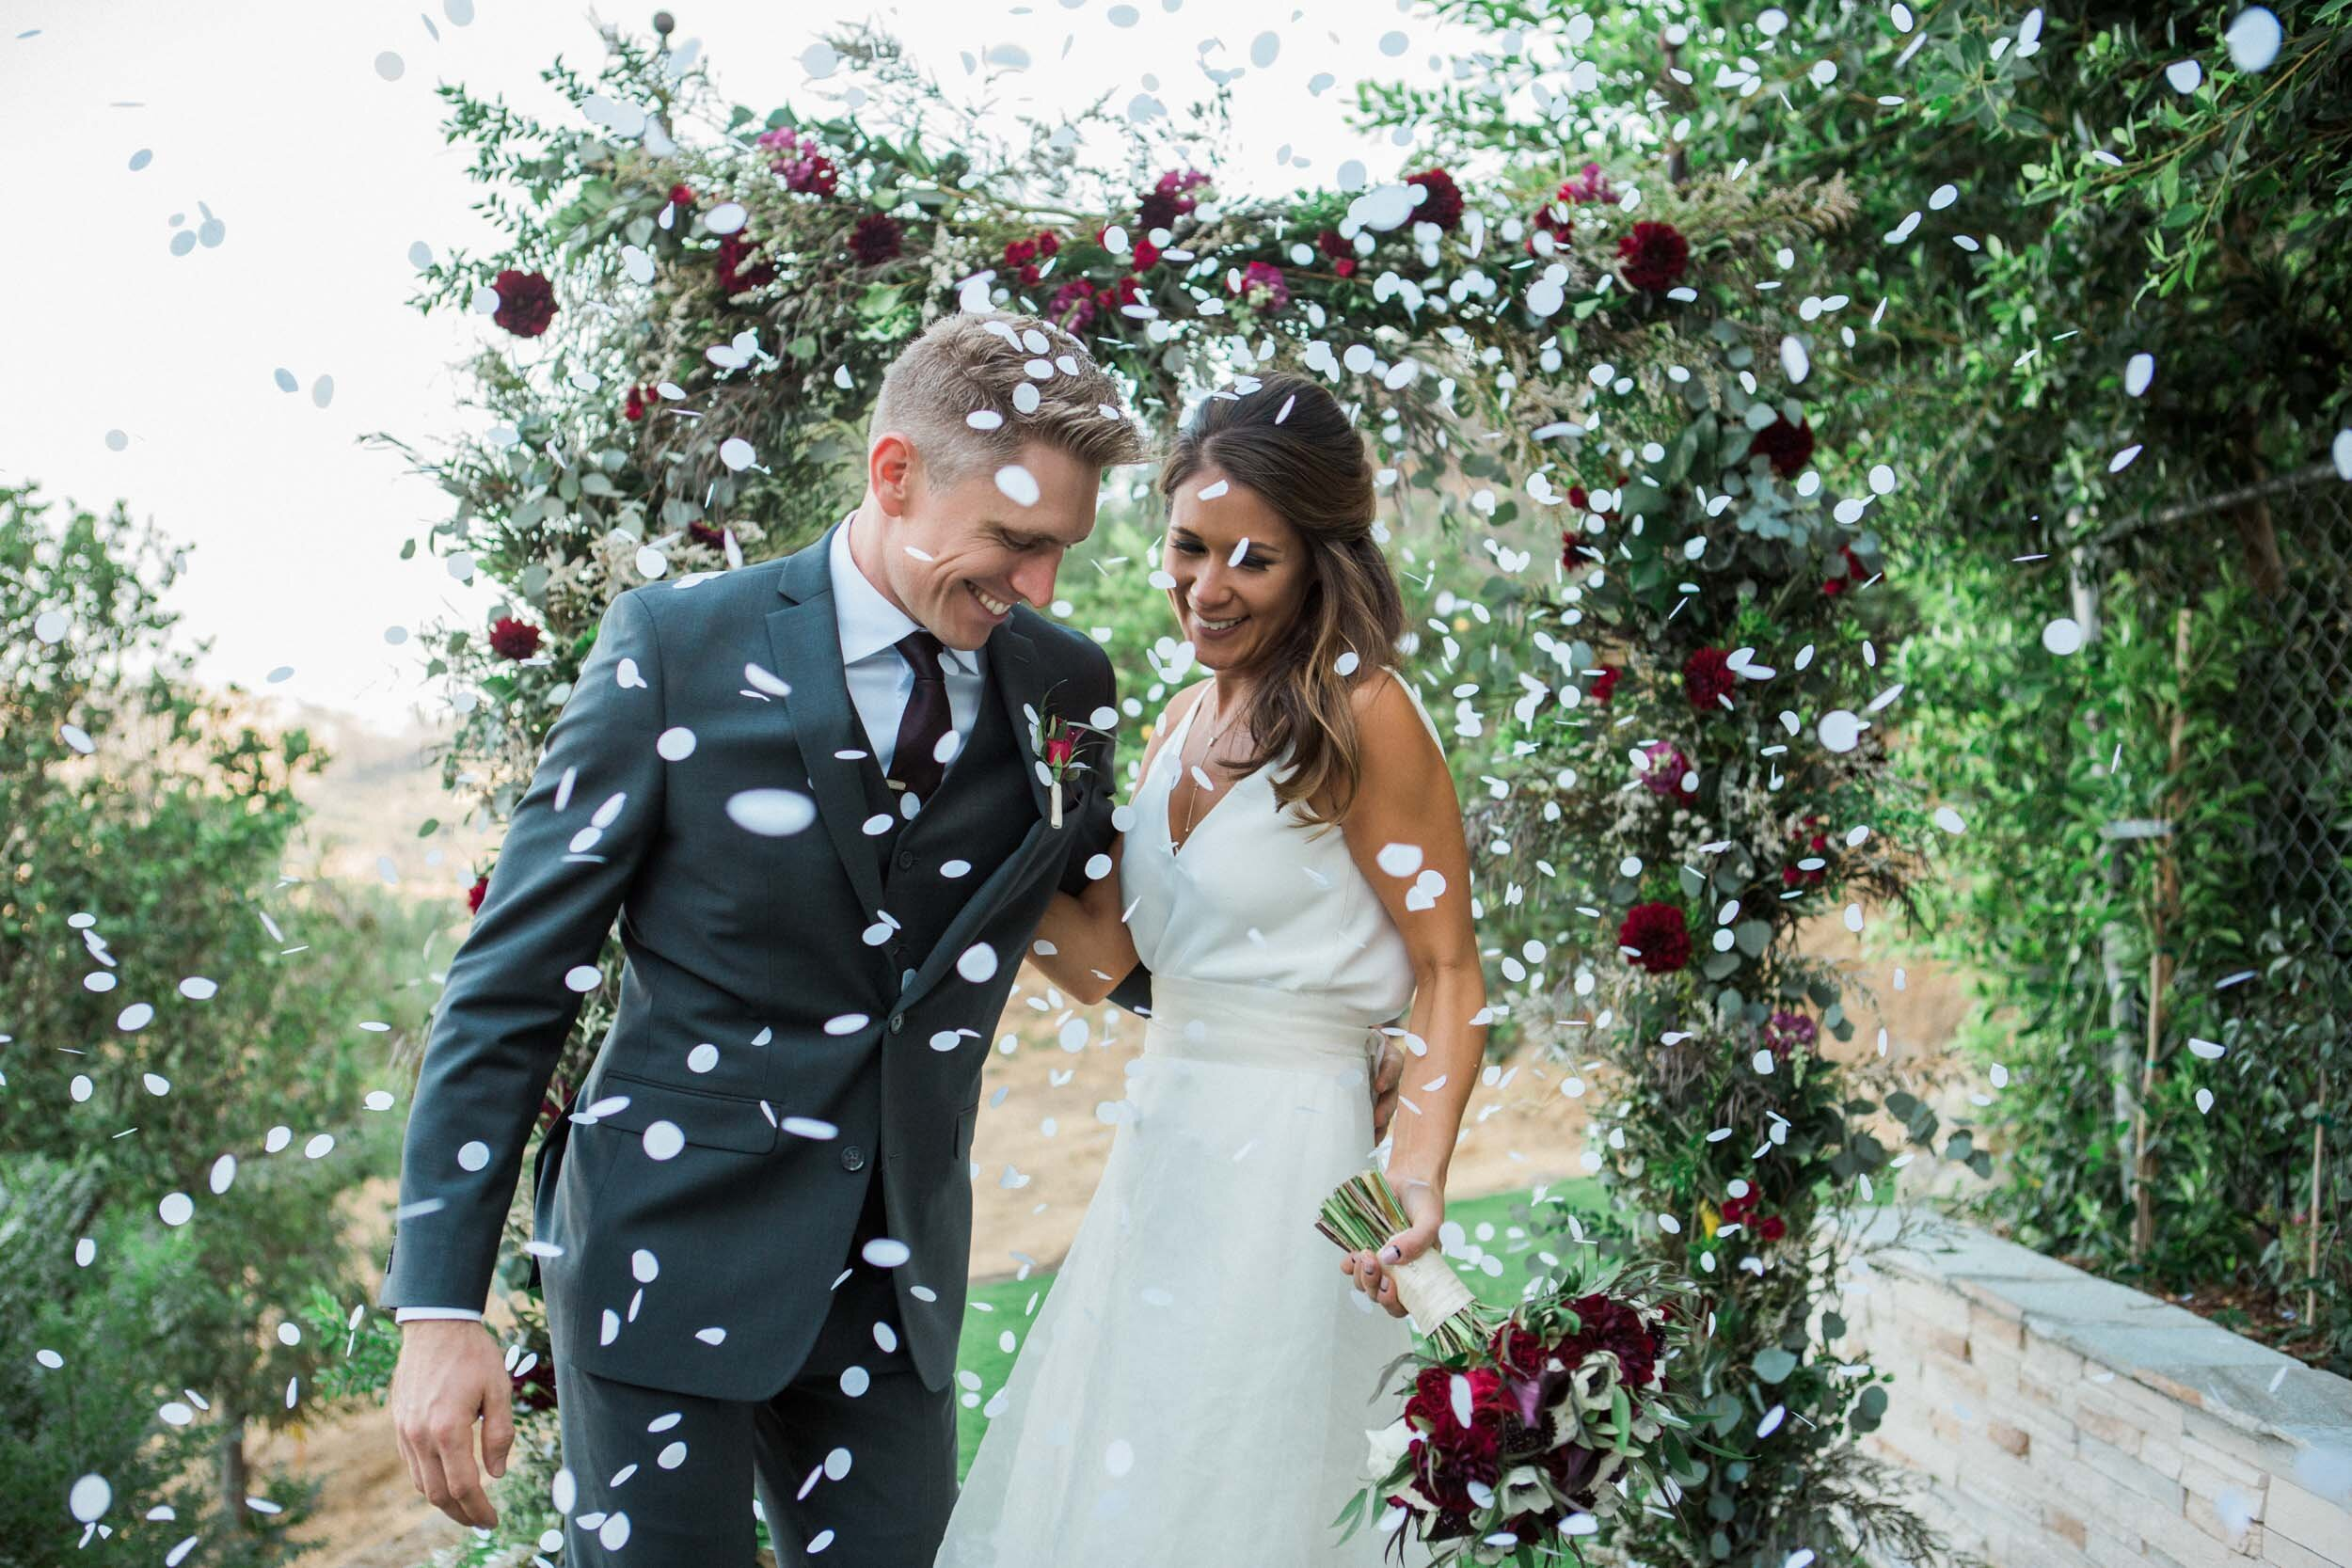 BKM-Photography-Highland-Park-Los-Angeles-Backyard-Wedding-0037.jpg